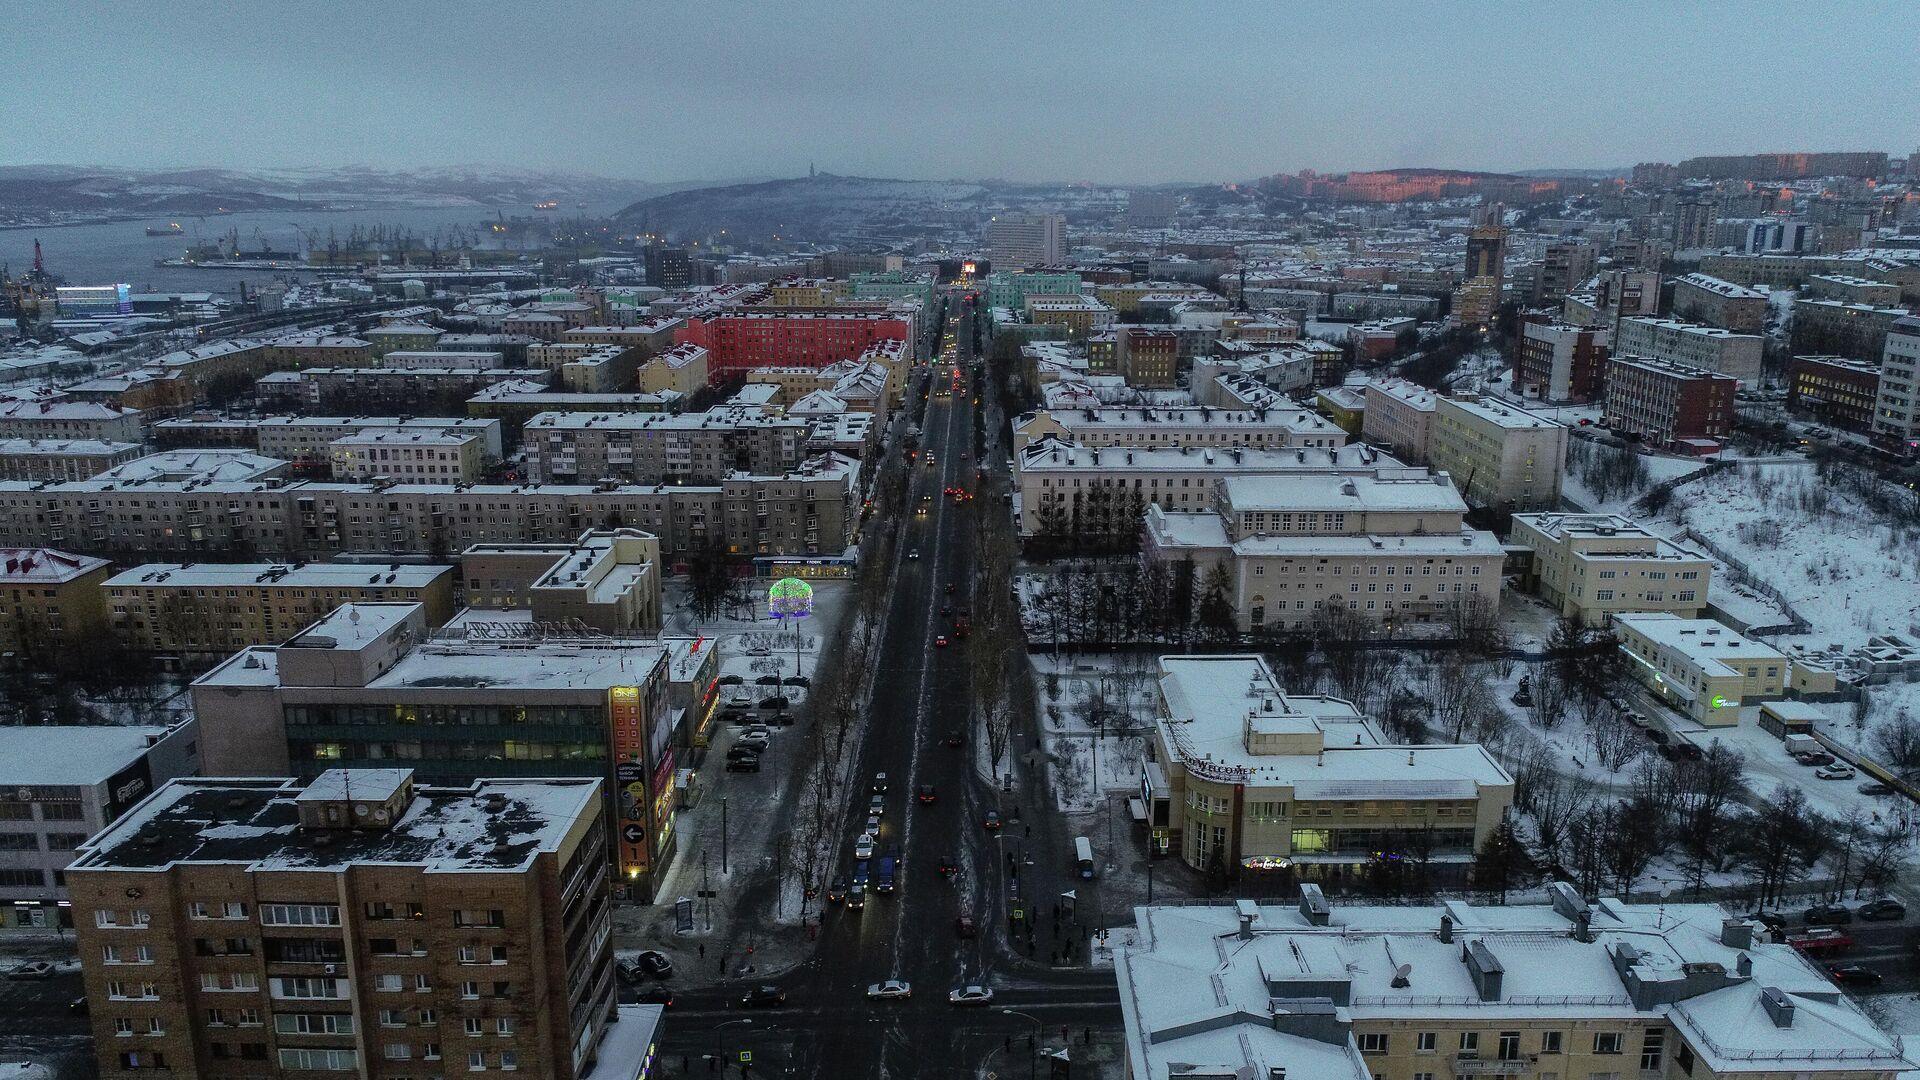 Проспект Ленина в Мурманске - РИА Новости, 1920, 18.03.2021